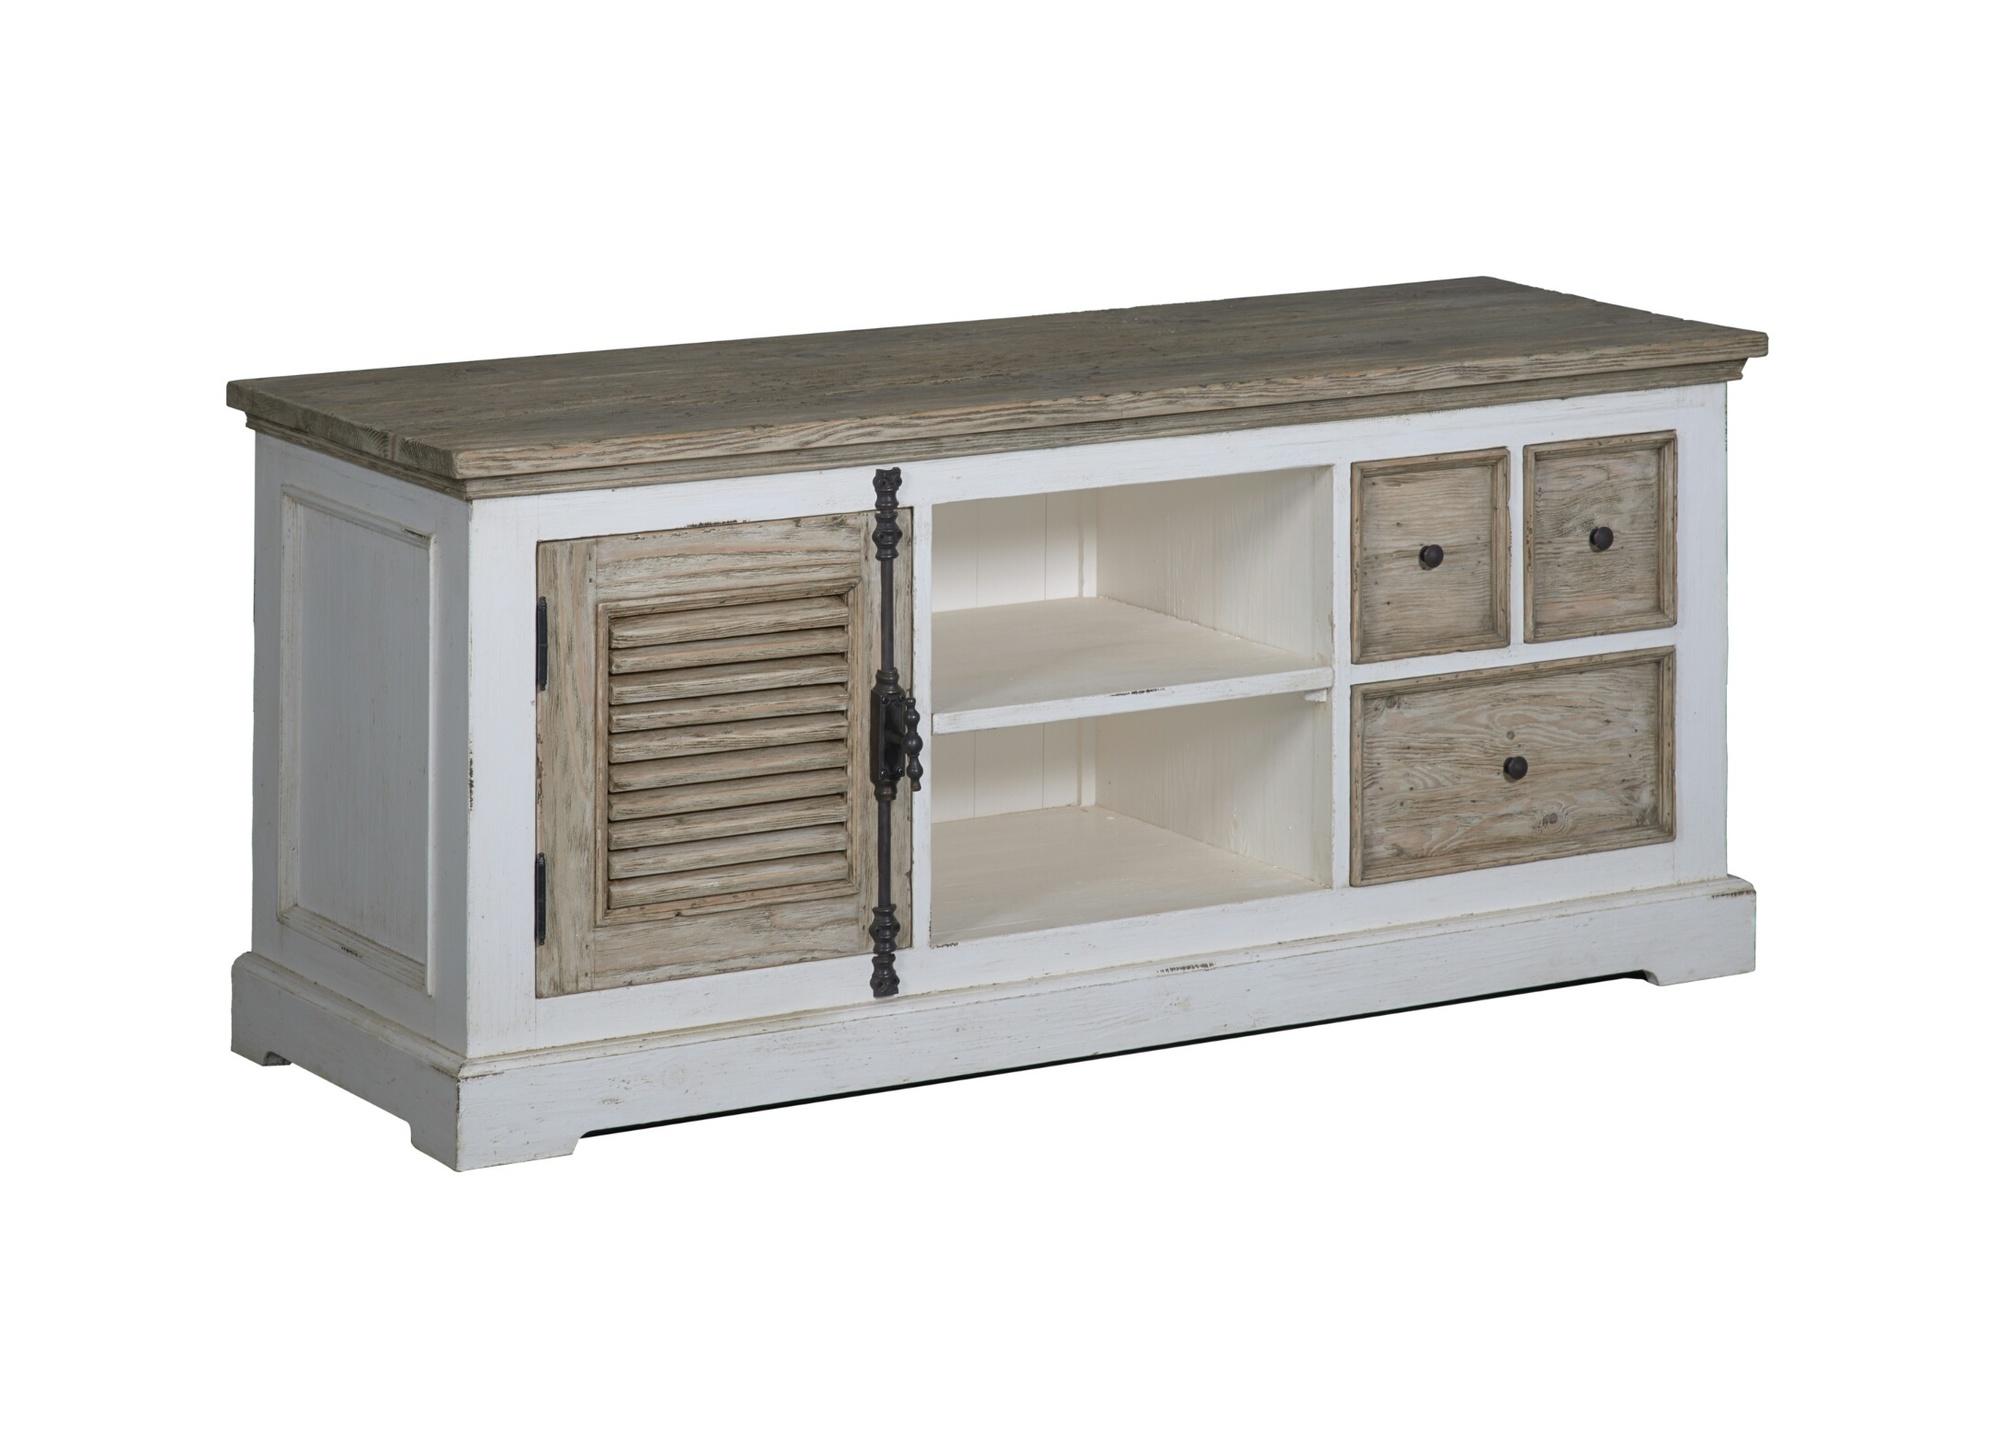 kast-tv dressoir-amanda-towerliving-TD 0017-oudwit-vergrijsd grenen-150cm